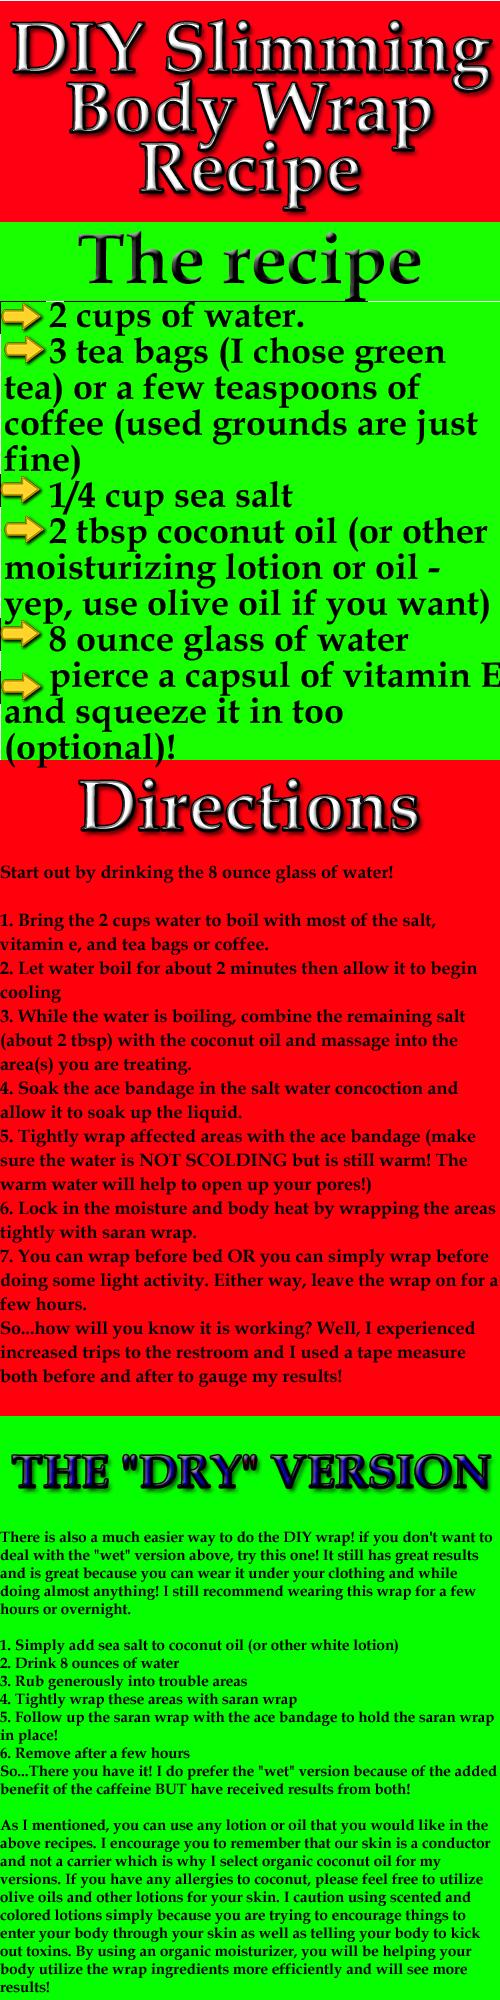 Diy Slimming Body Wrap Recipe Ab Workouts Sum Slimming Body